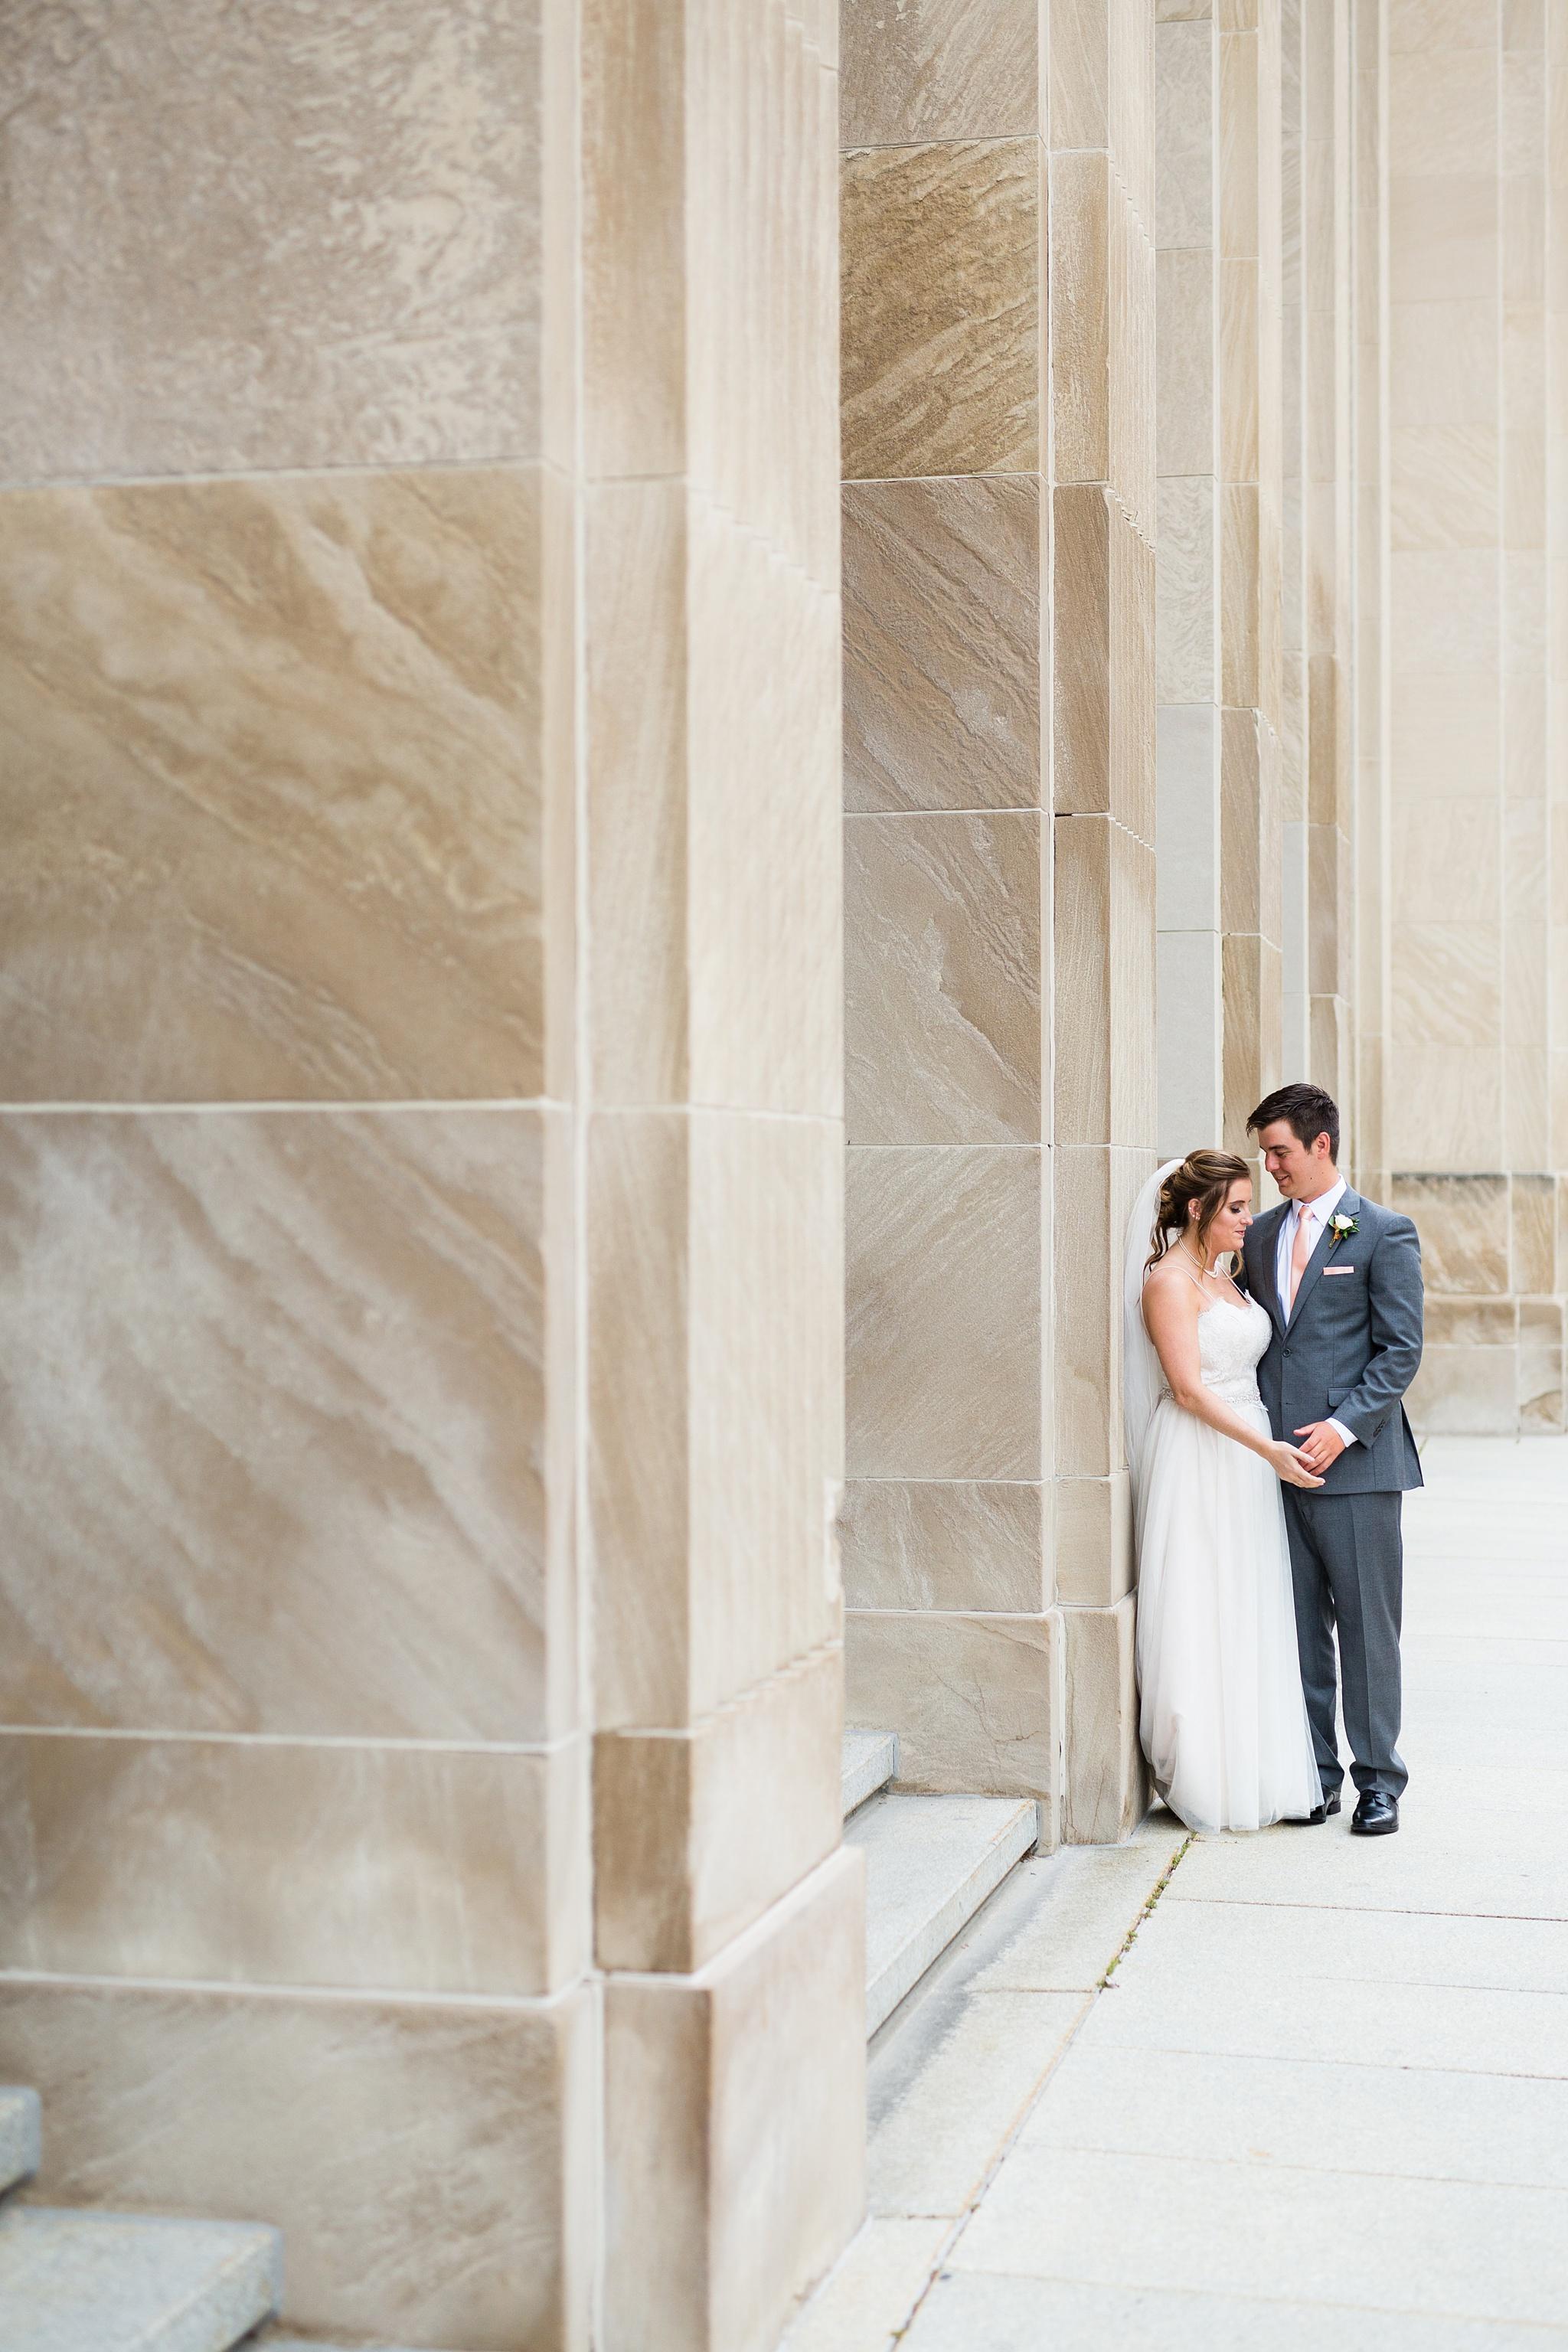 Meghan_Drew_Grand_Rapids_Cheney_place_Wedding035.JPG